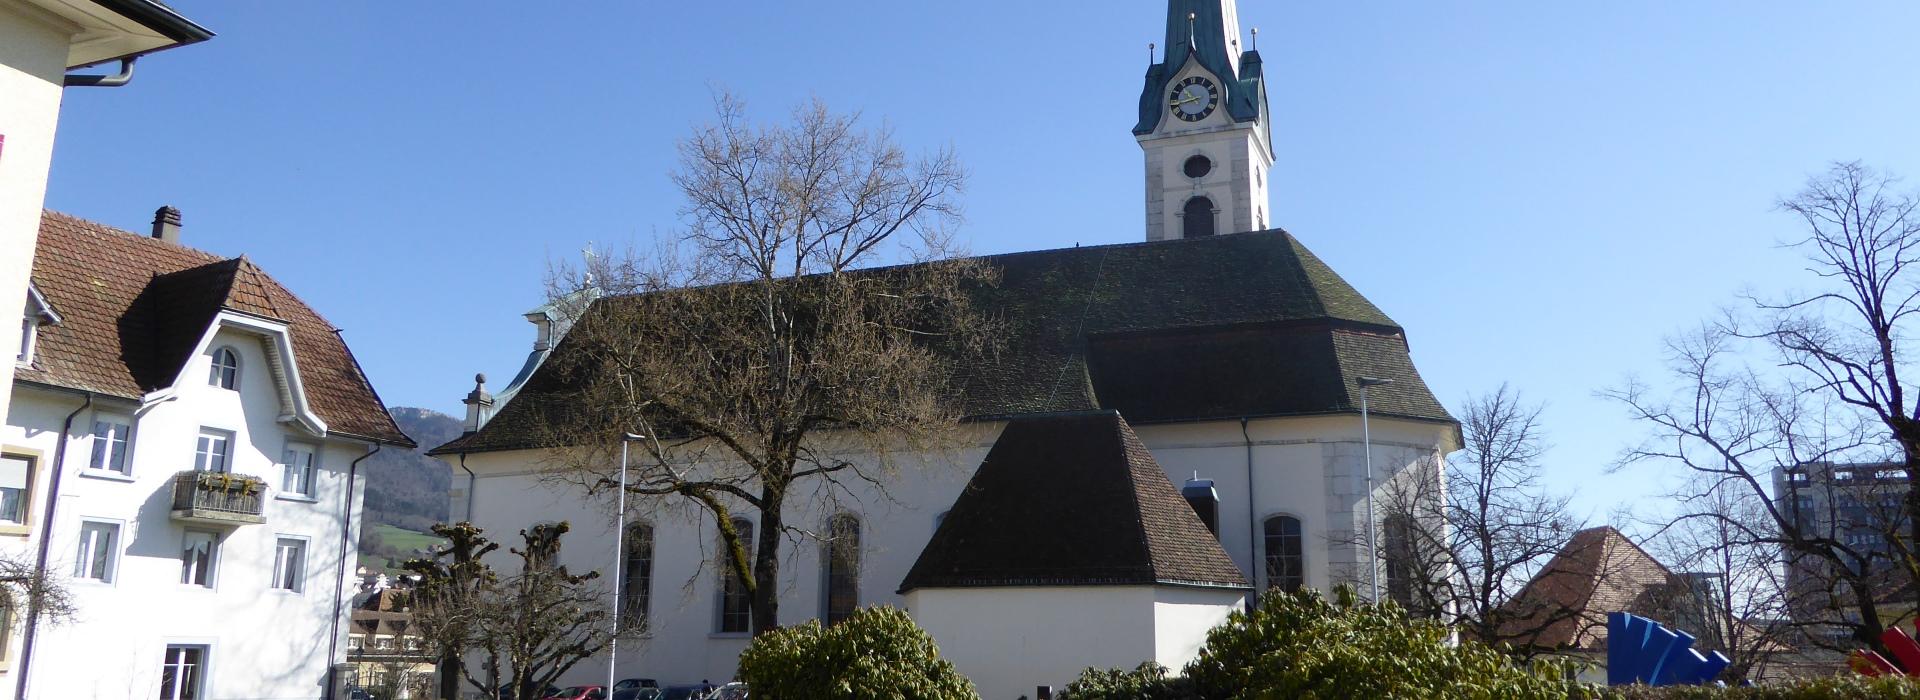 Quelle: Pfarrei St. Eusebius Grenchen